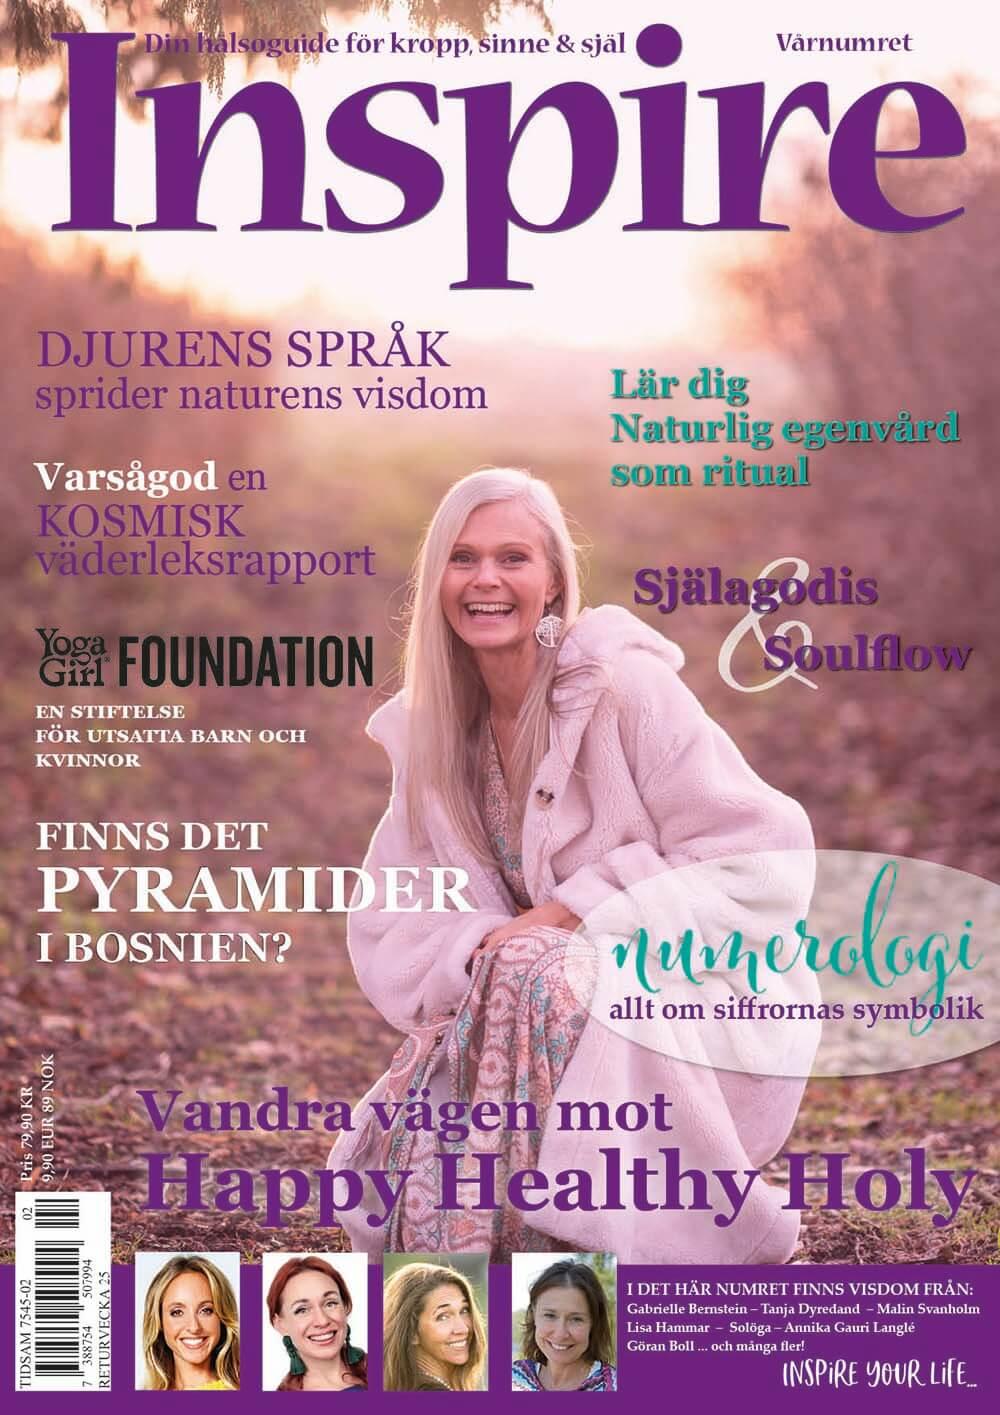 Zoës krönika, Inspire tidningen, april 2020